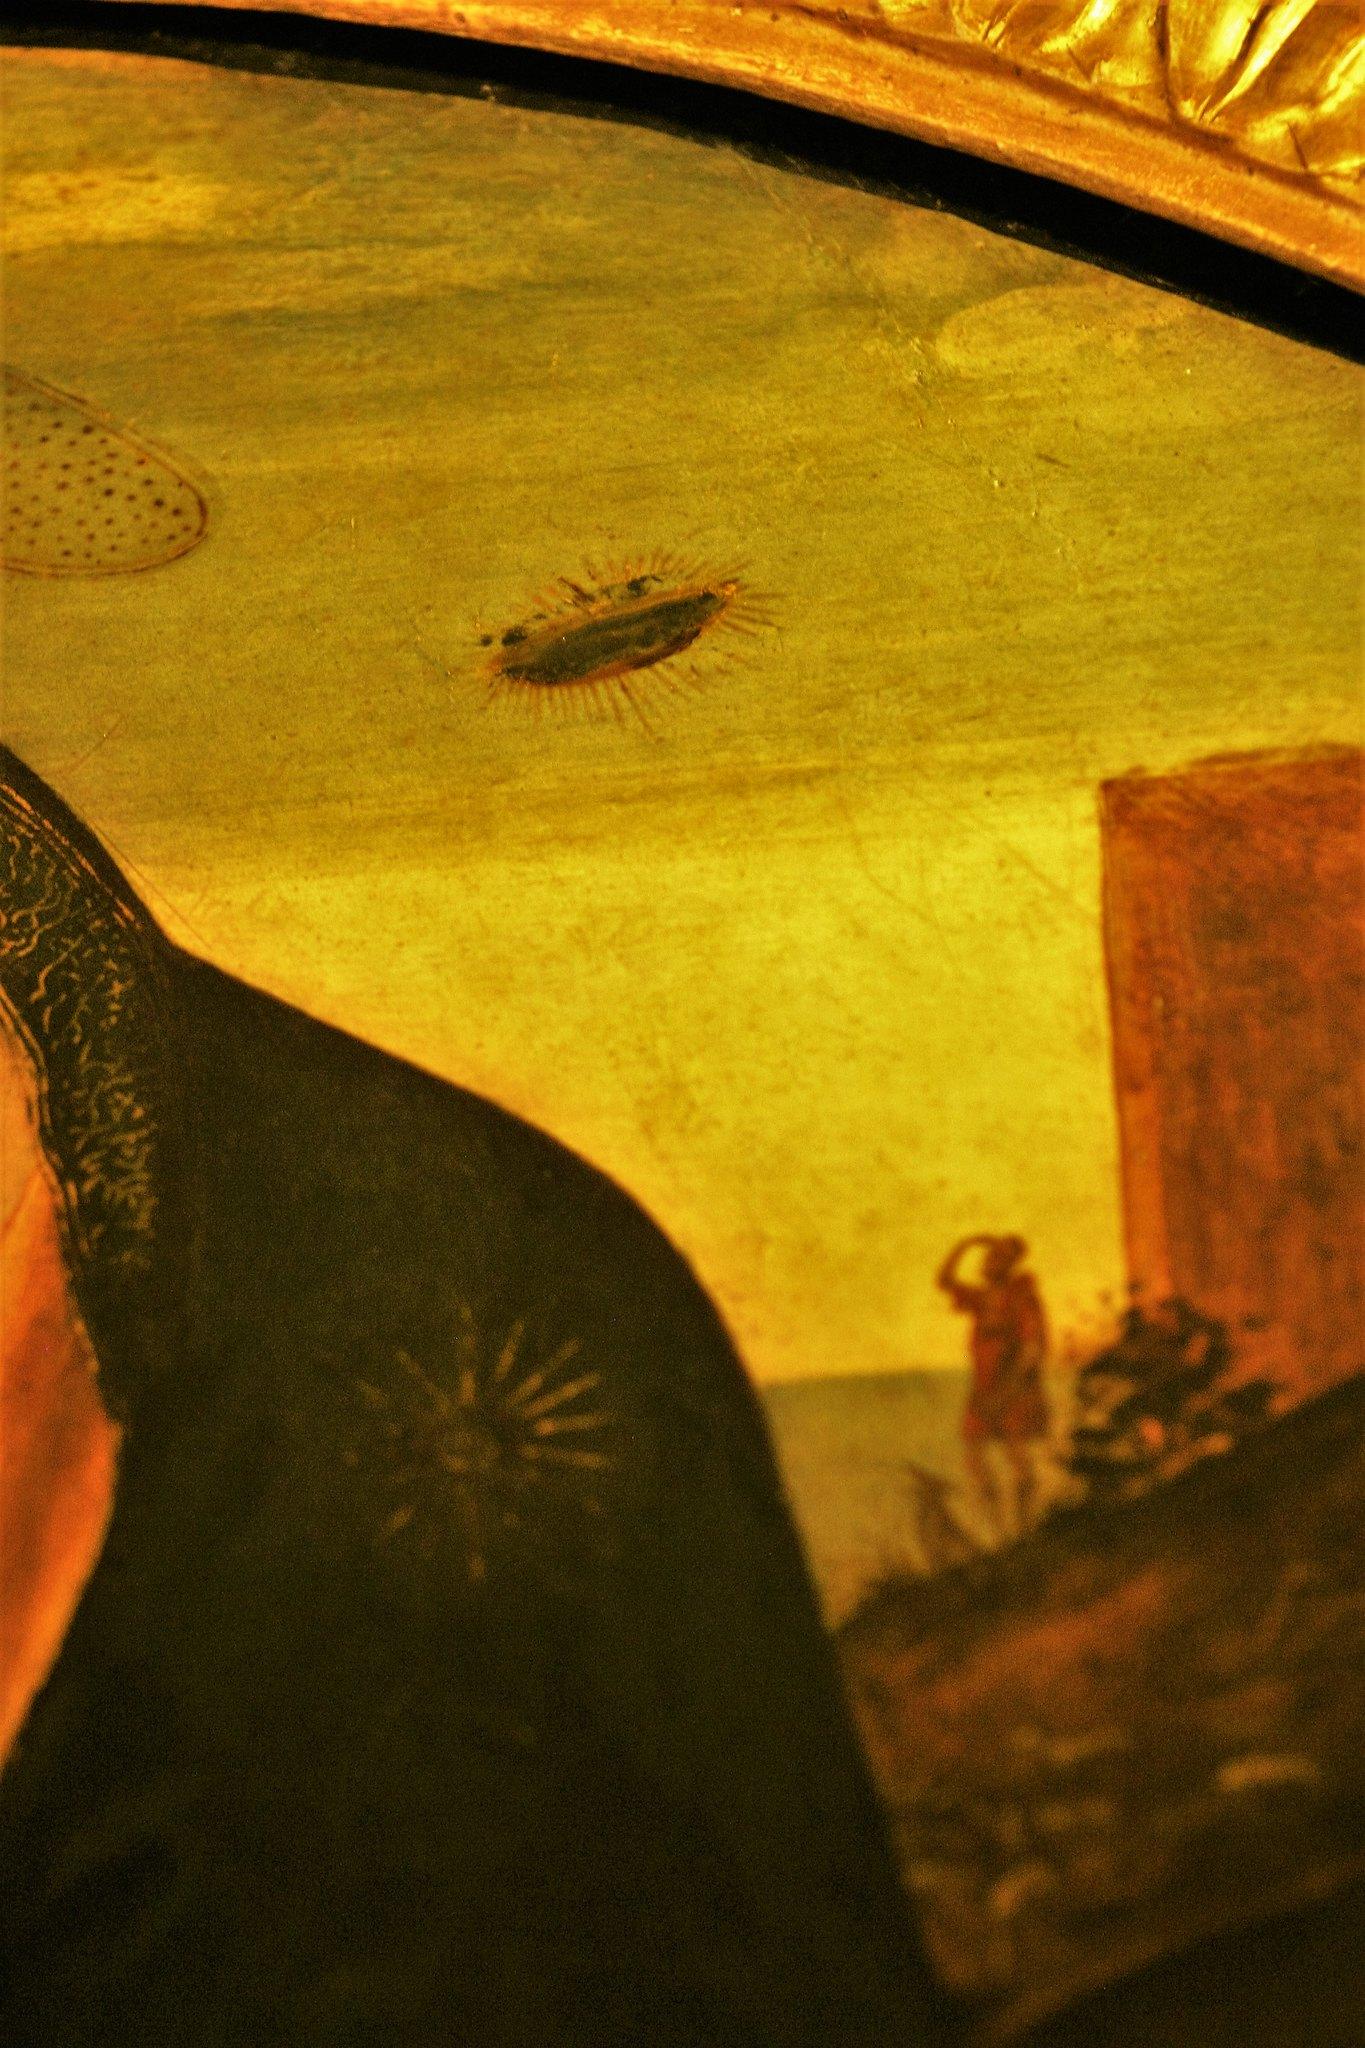 Madonna mit dem UFO2